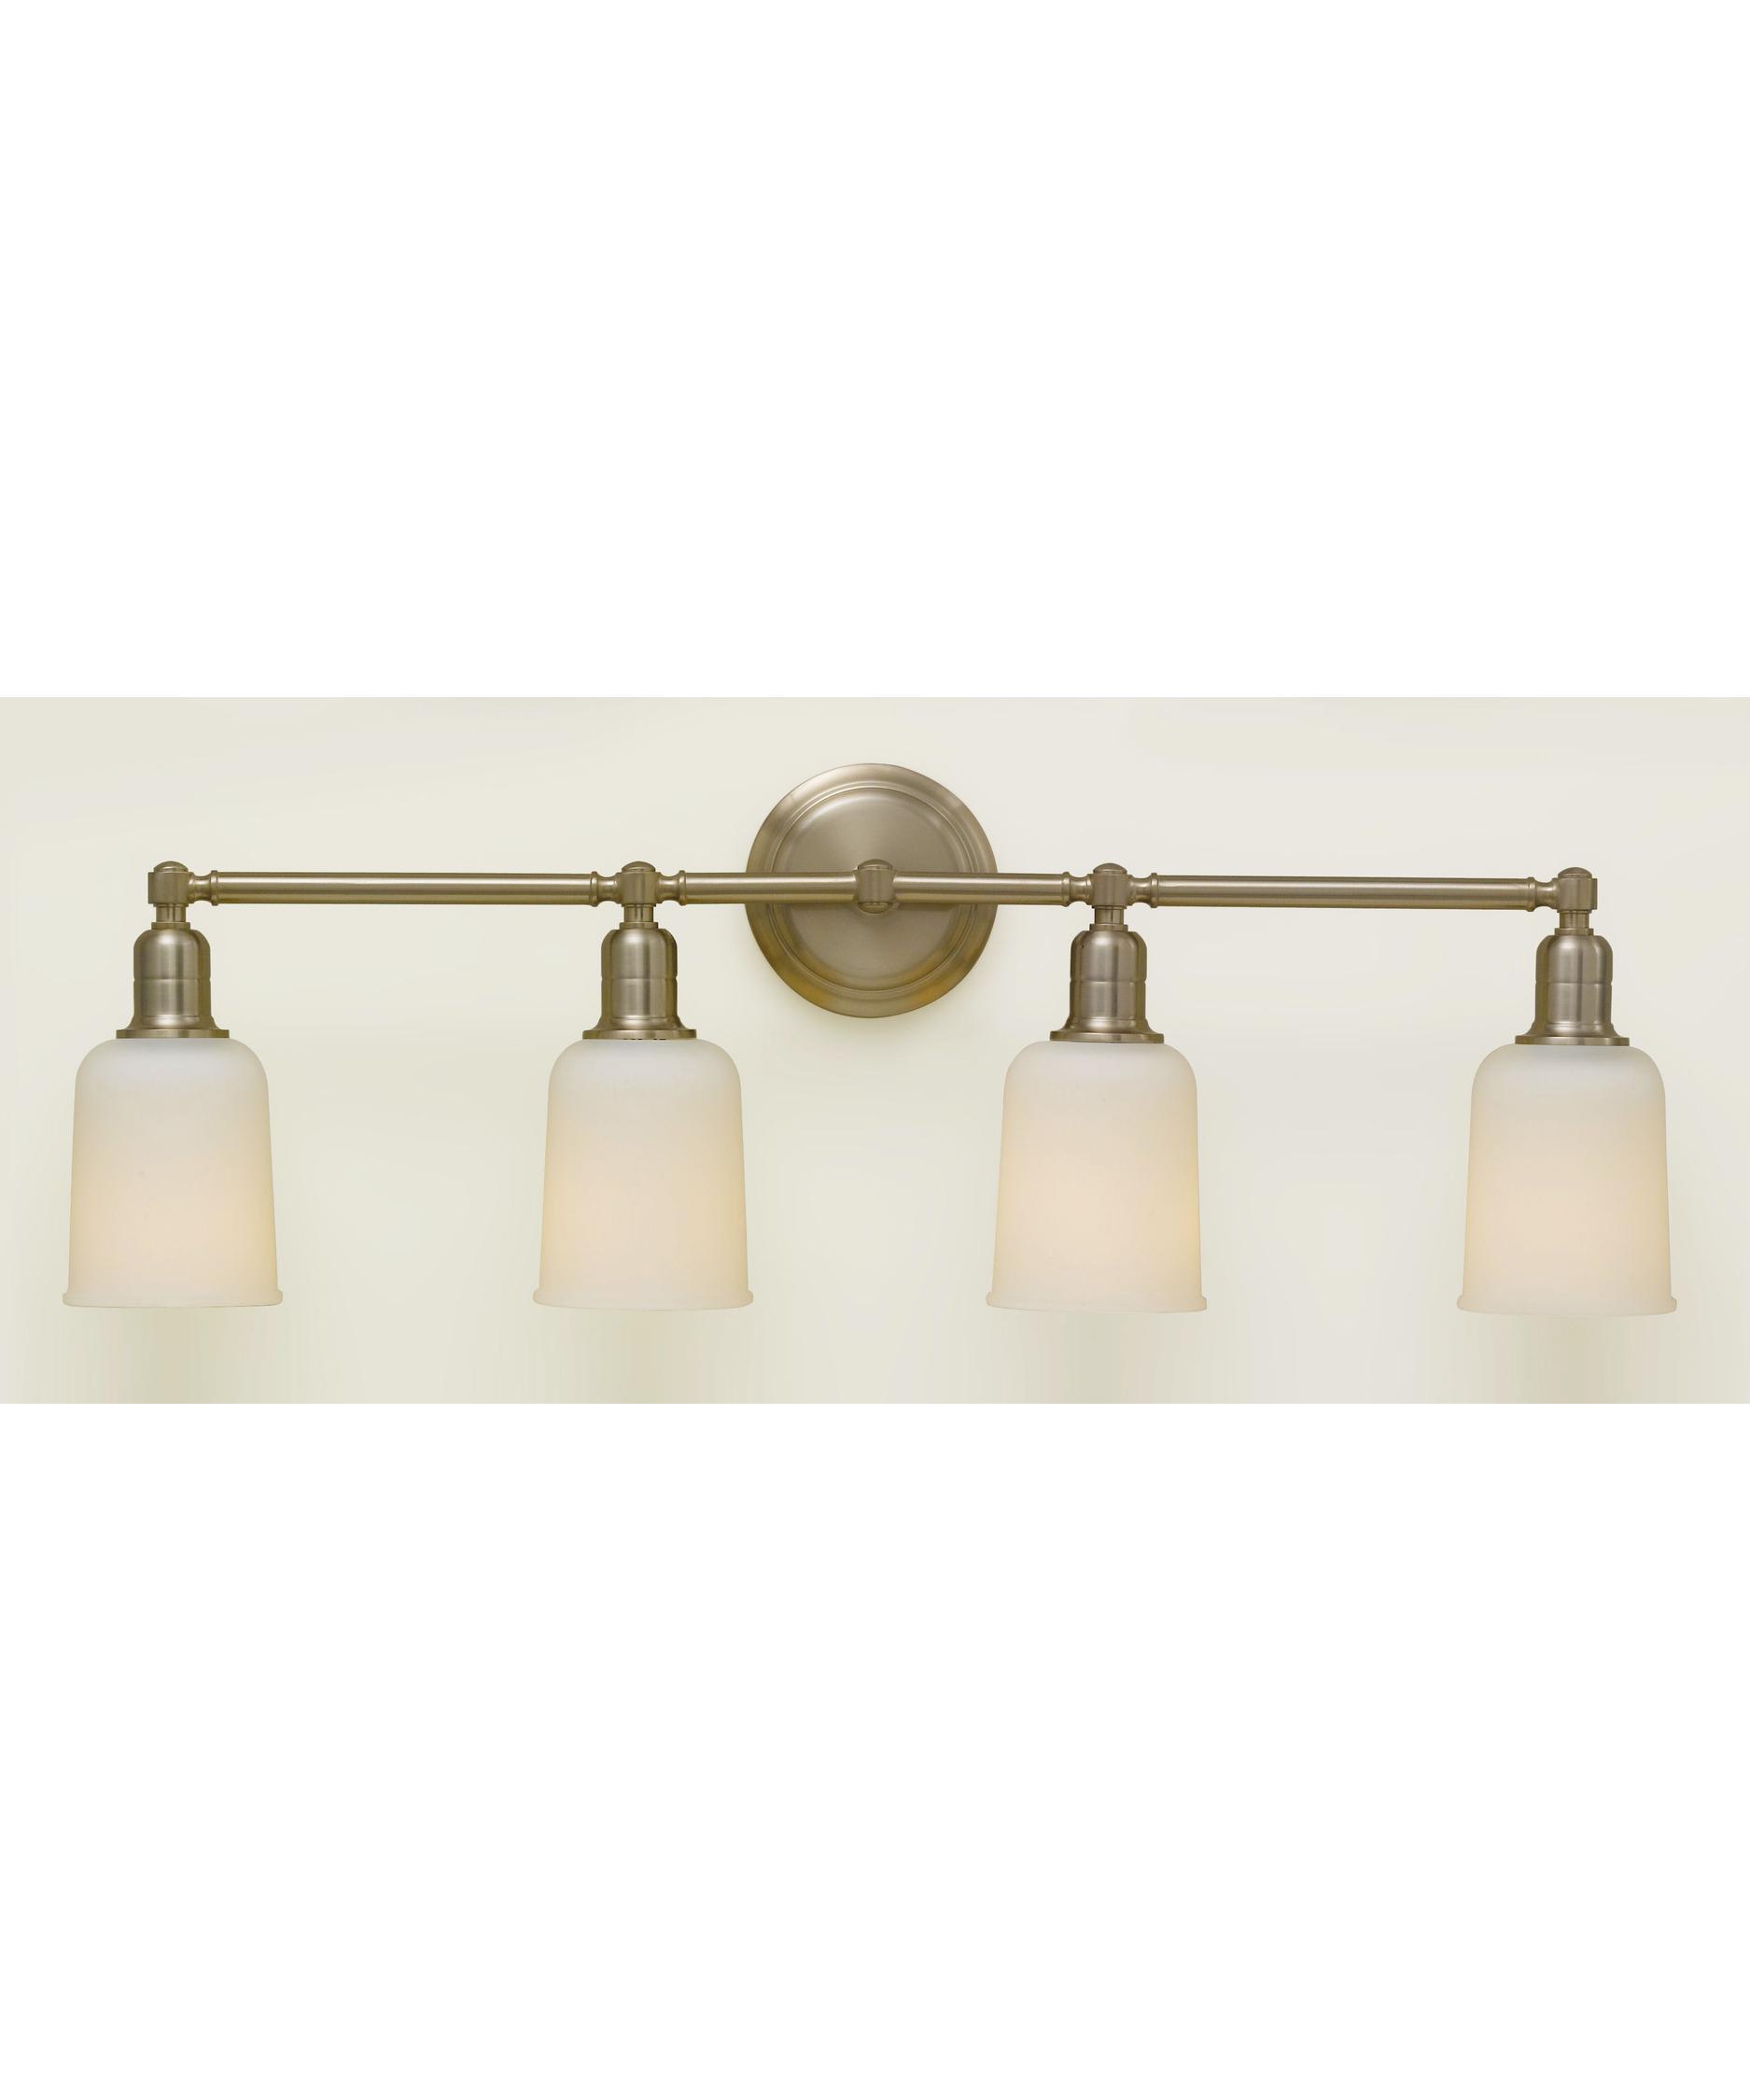 Murray Feiss Outdoor Lighting: Murray Feiss VS14604 Tarrington 32 Inch Bath Vanity Light